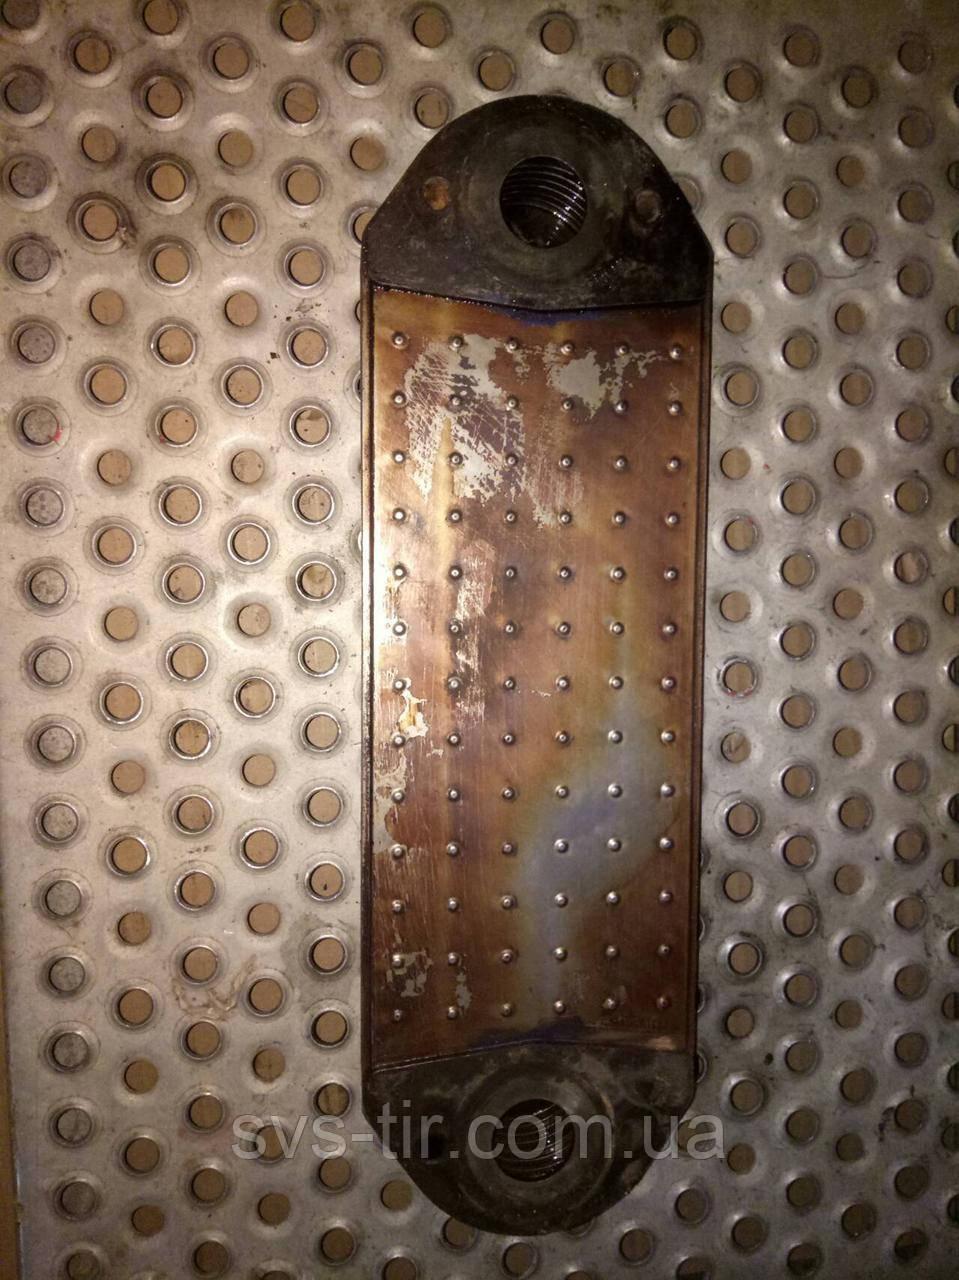 Теплообменник volvo fm12 Кожухотрубный конденсатор Alfa Laval CRF213-6-S 2P Абакан